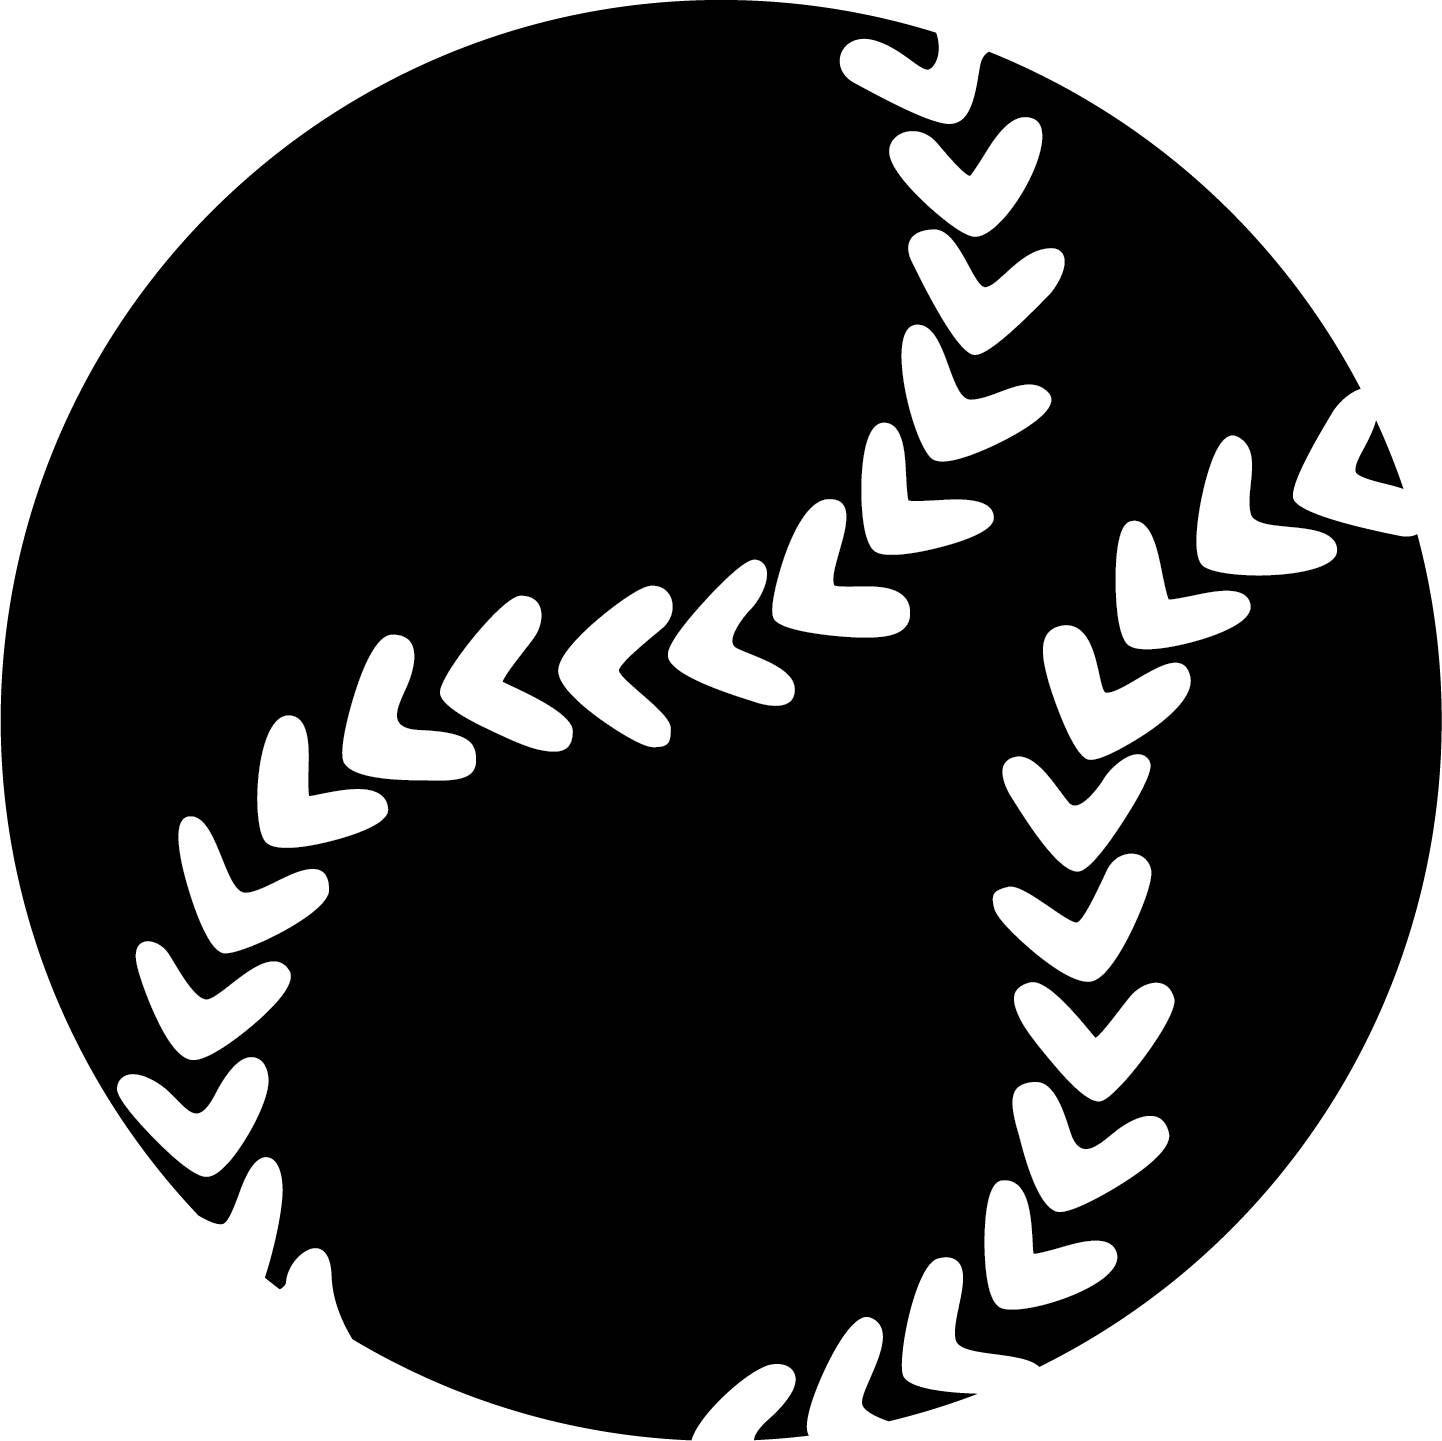 softball ai eps jpg png and svg clipart vinyl stencil cricut silhouette cameo by riasdigitaldesigns on etsy  [ 1442 x 1441 Pixel ]